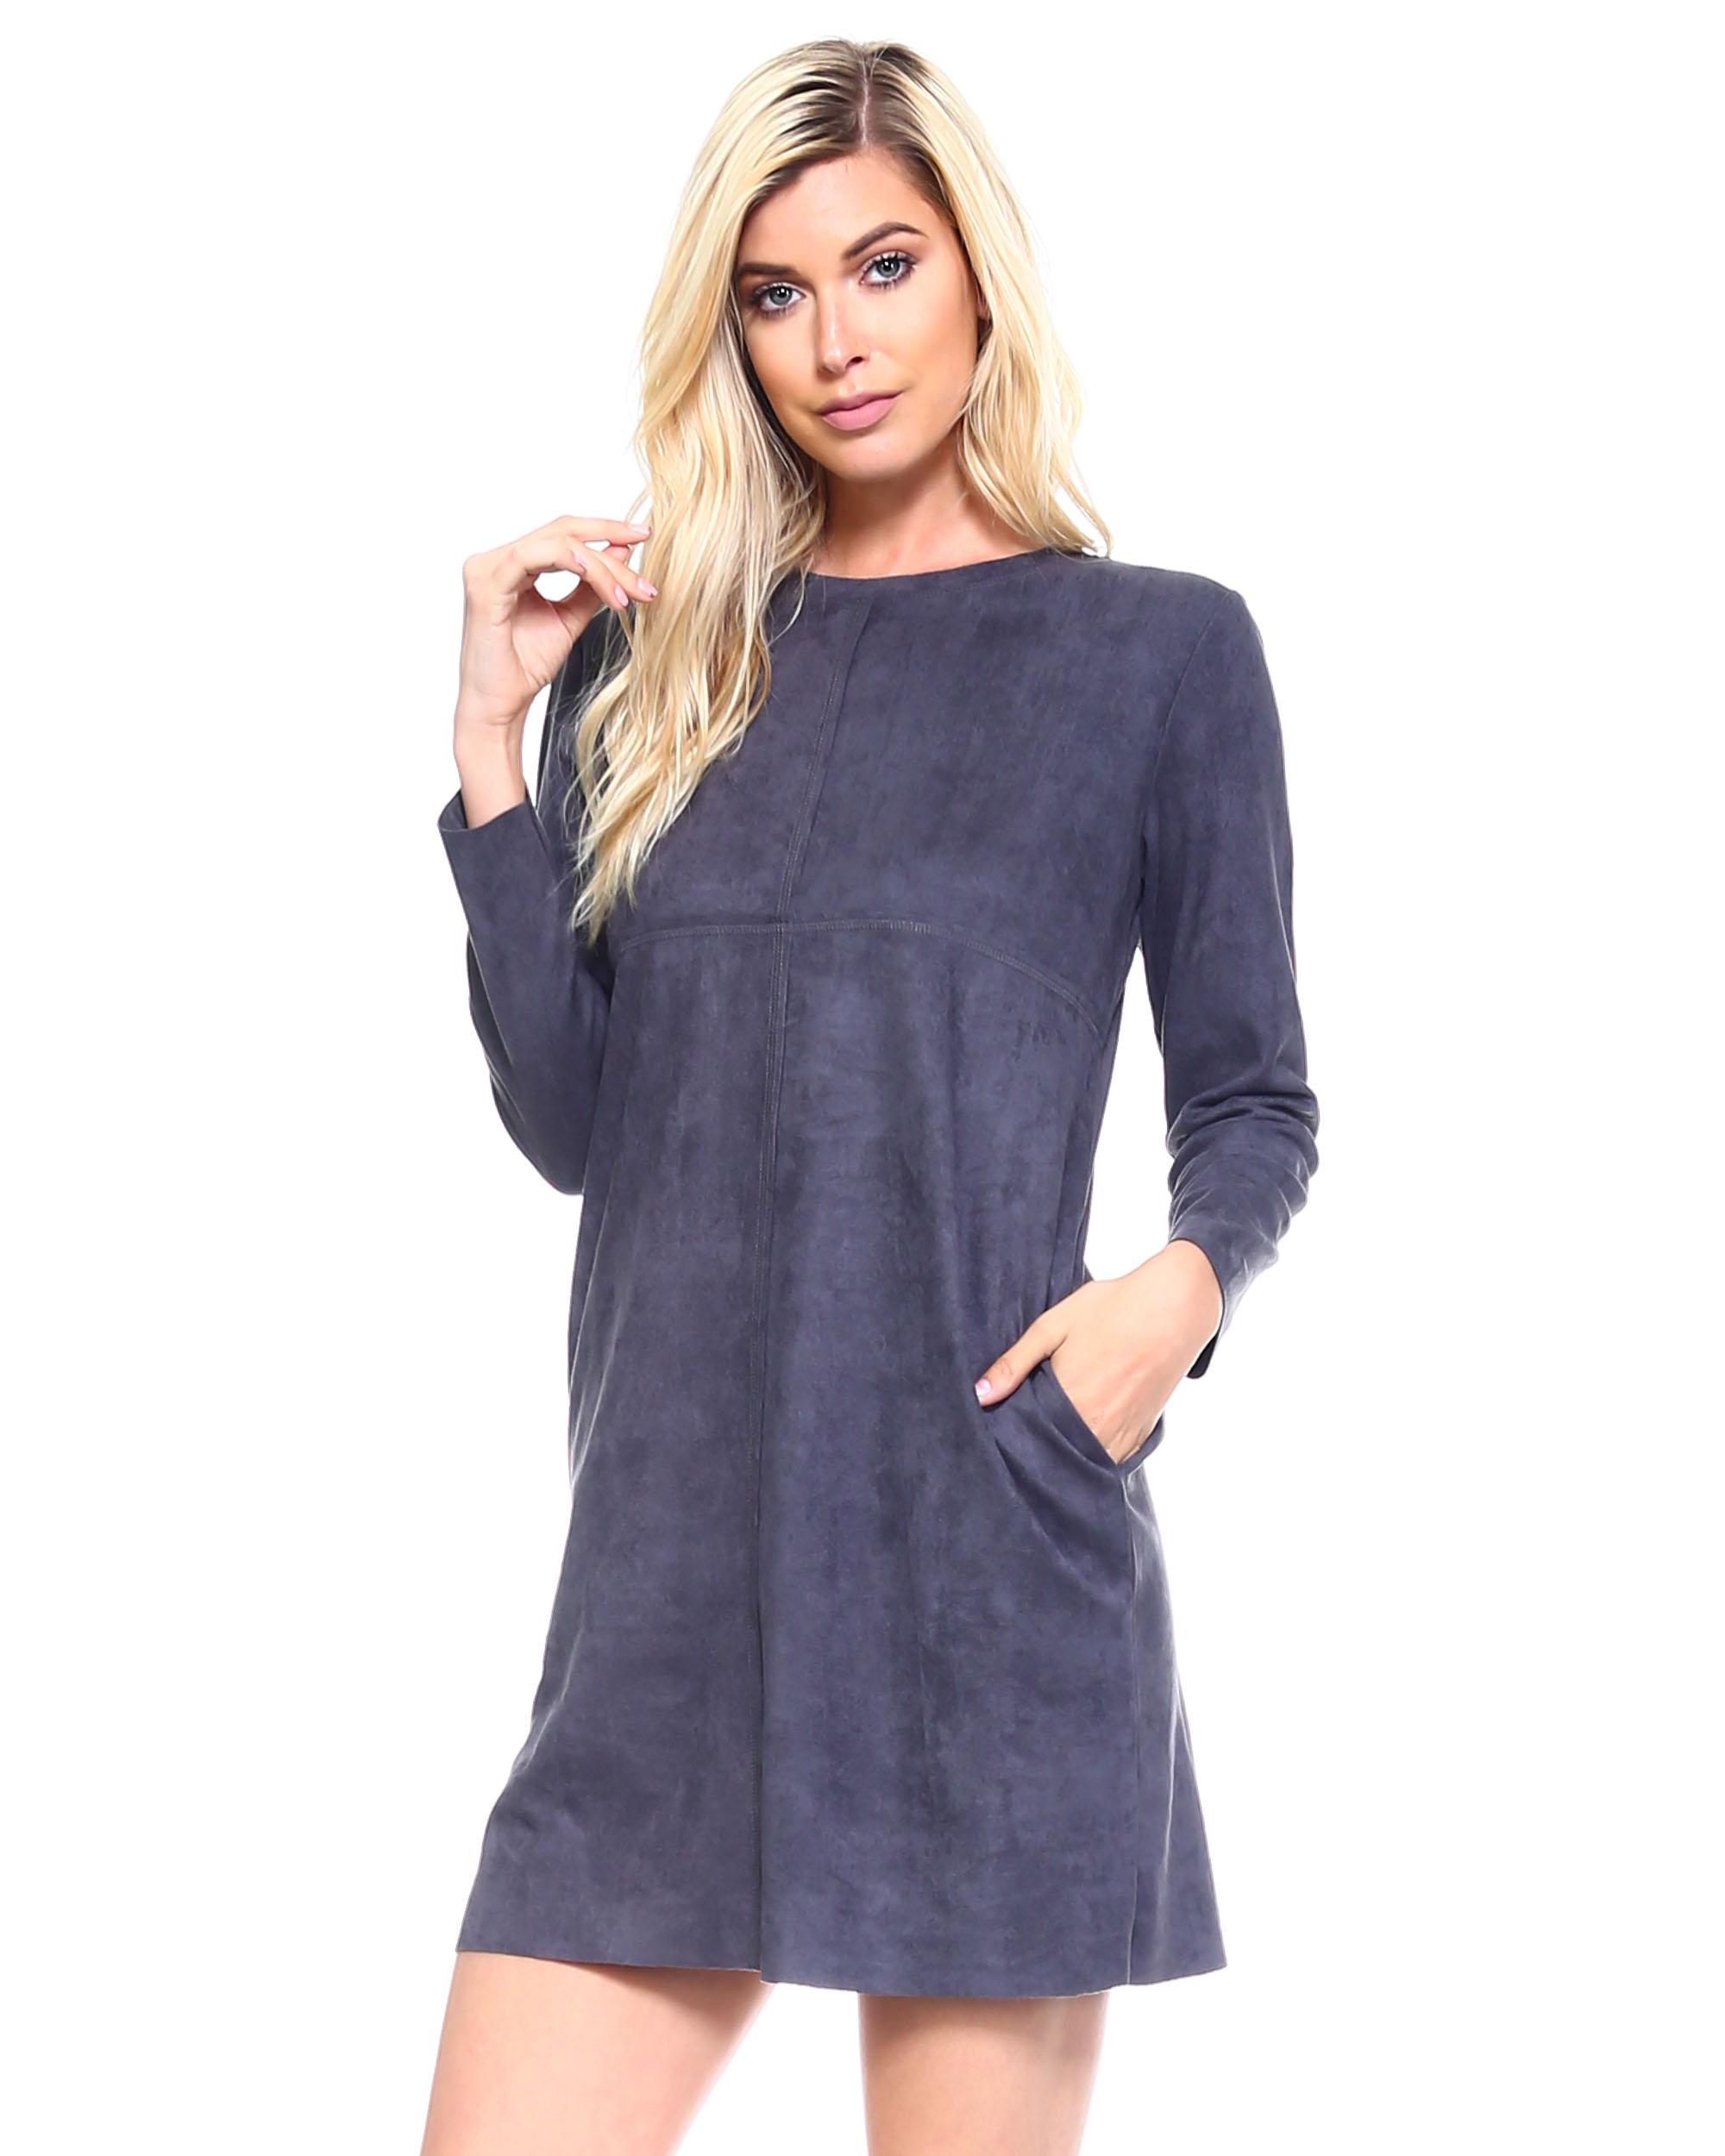 Faux Suede Aurora Dress -Charcoal - Front